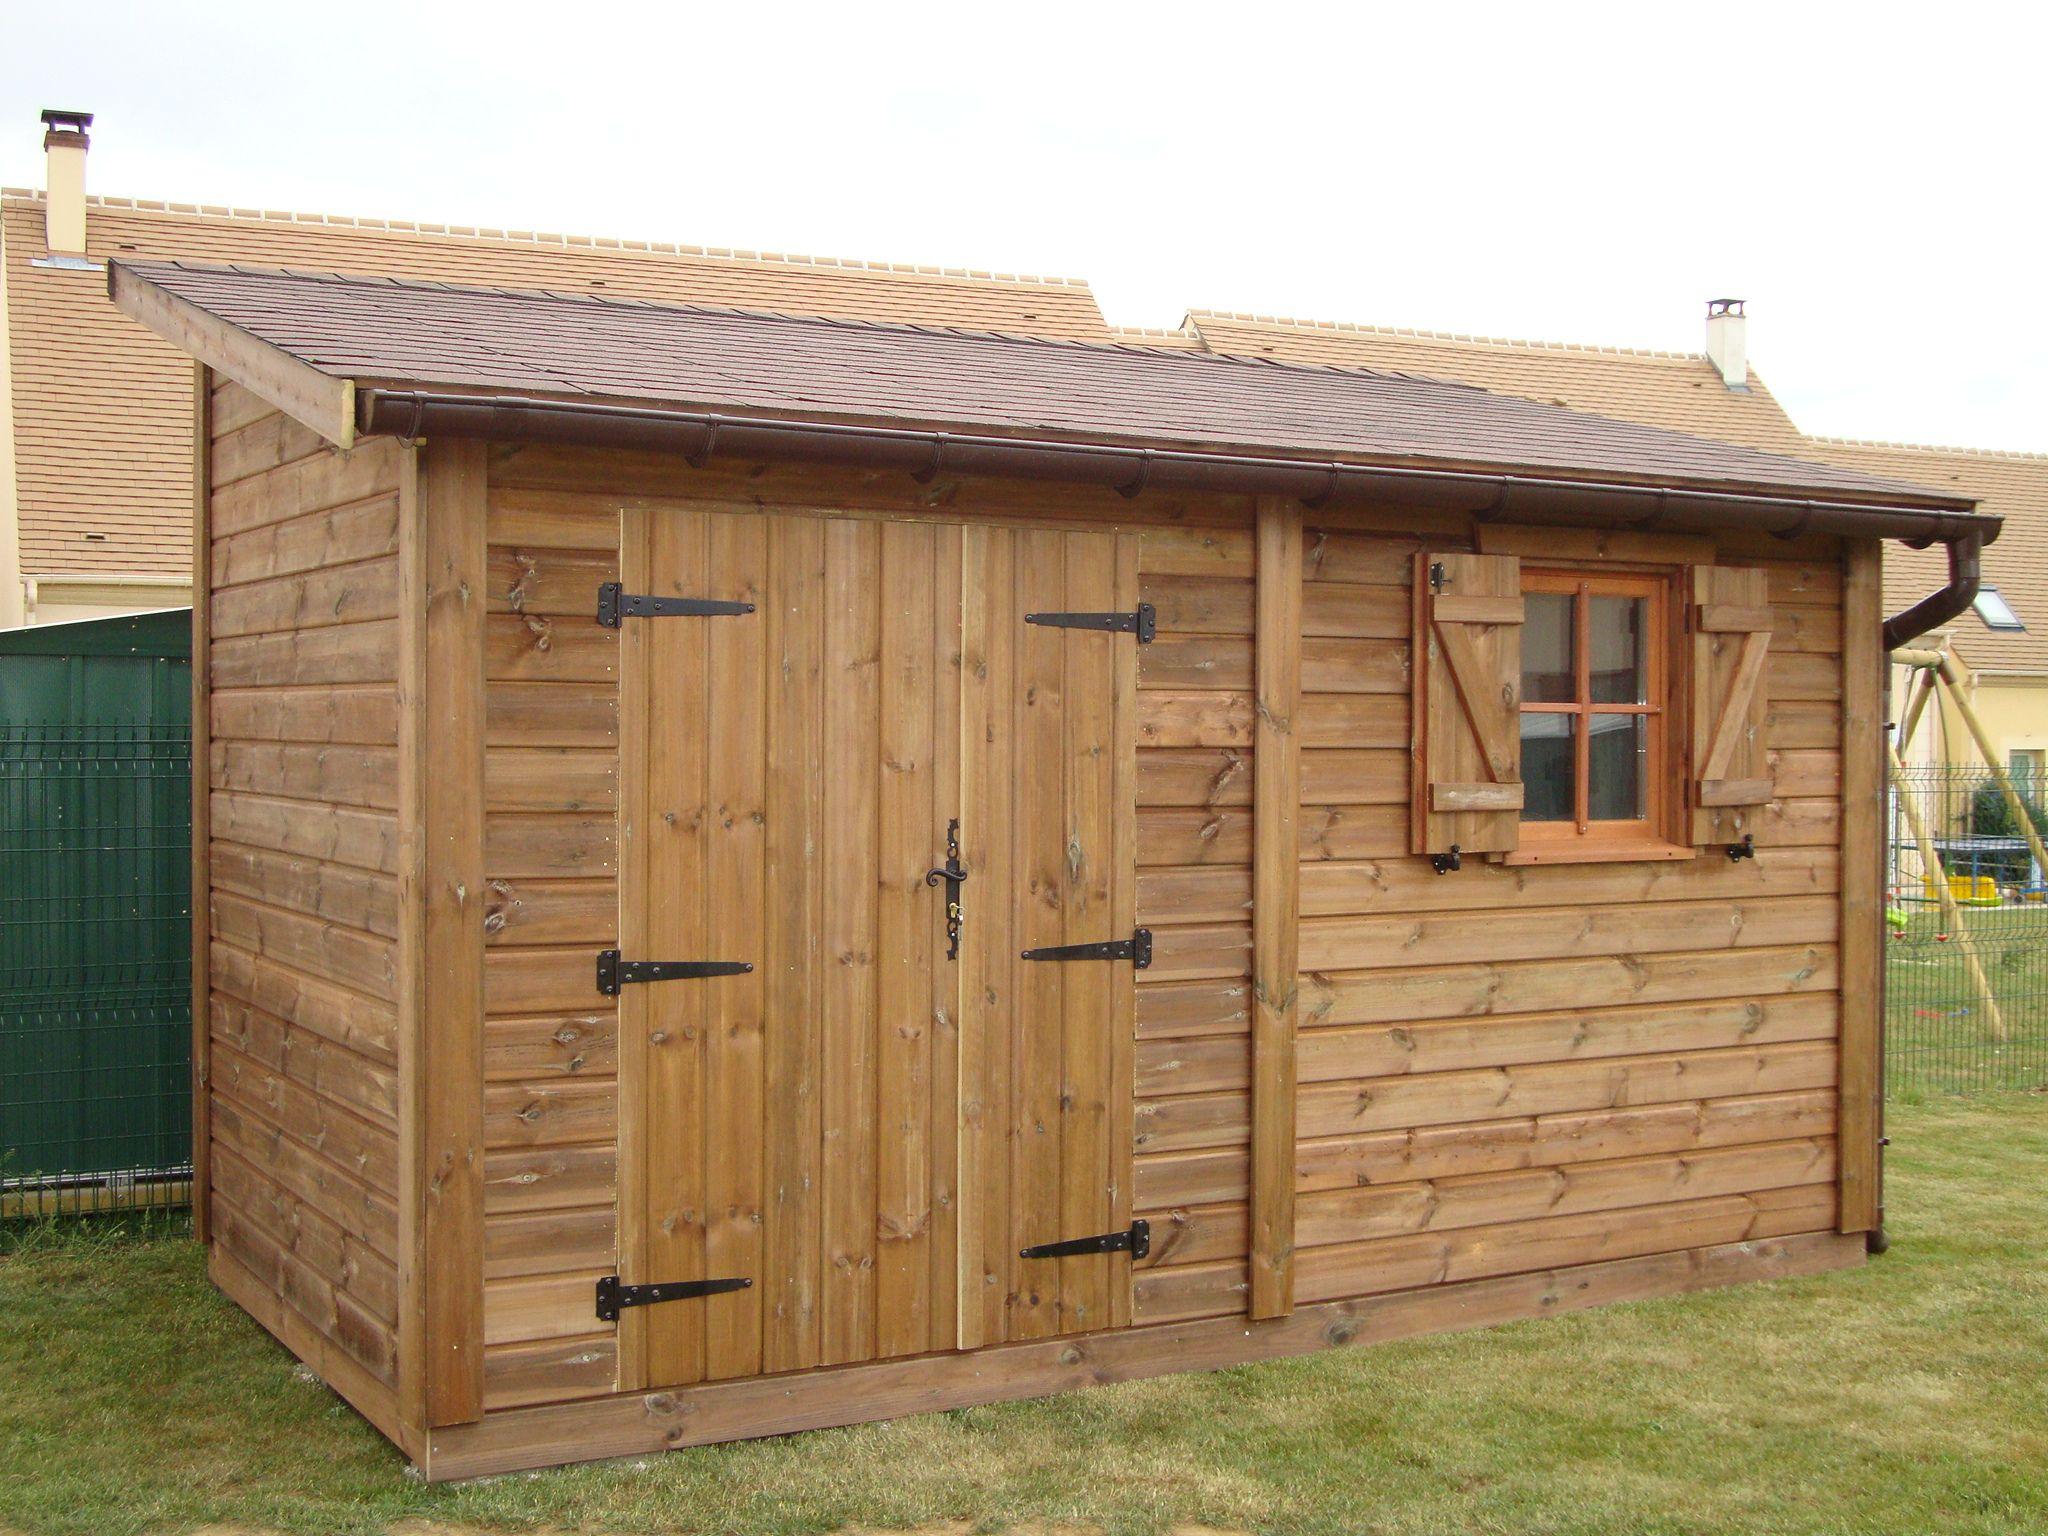 Grande Cabane De Jardin Pas Cher terrasse en bois: construction abri de jardin